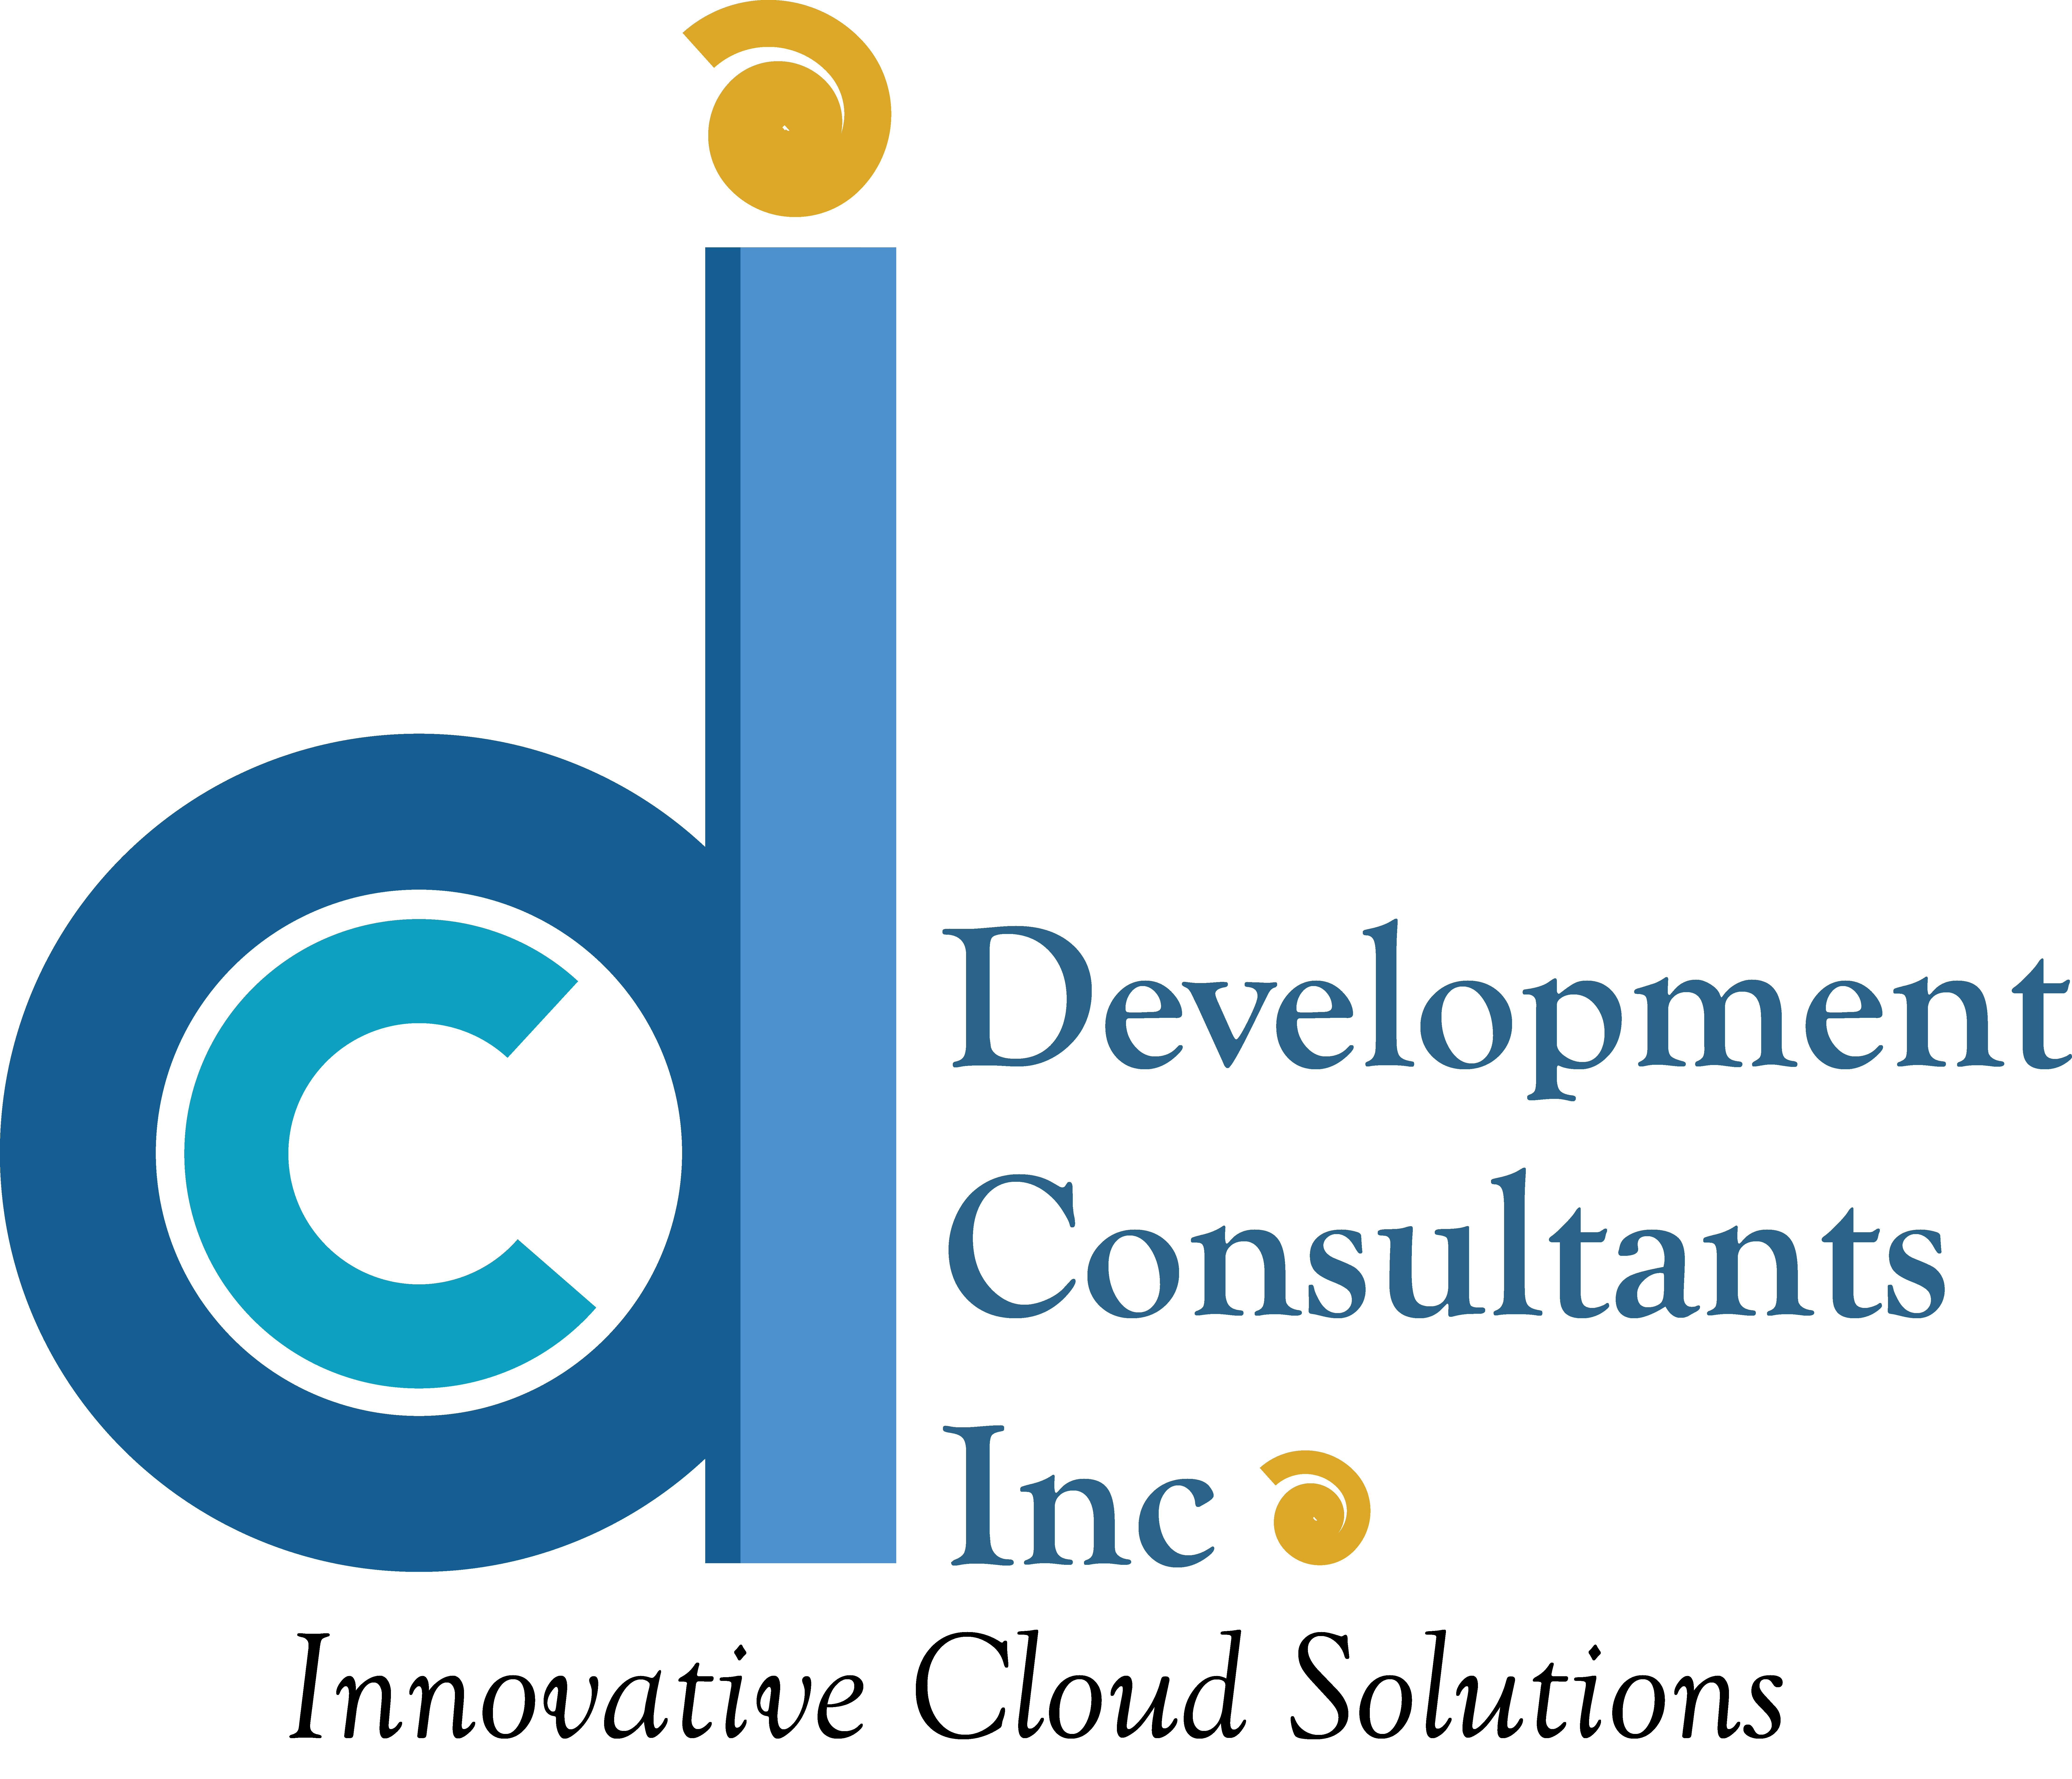 Development Consultants Incorporated (DCI) logo